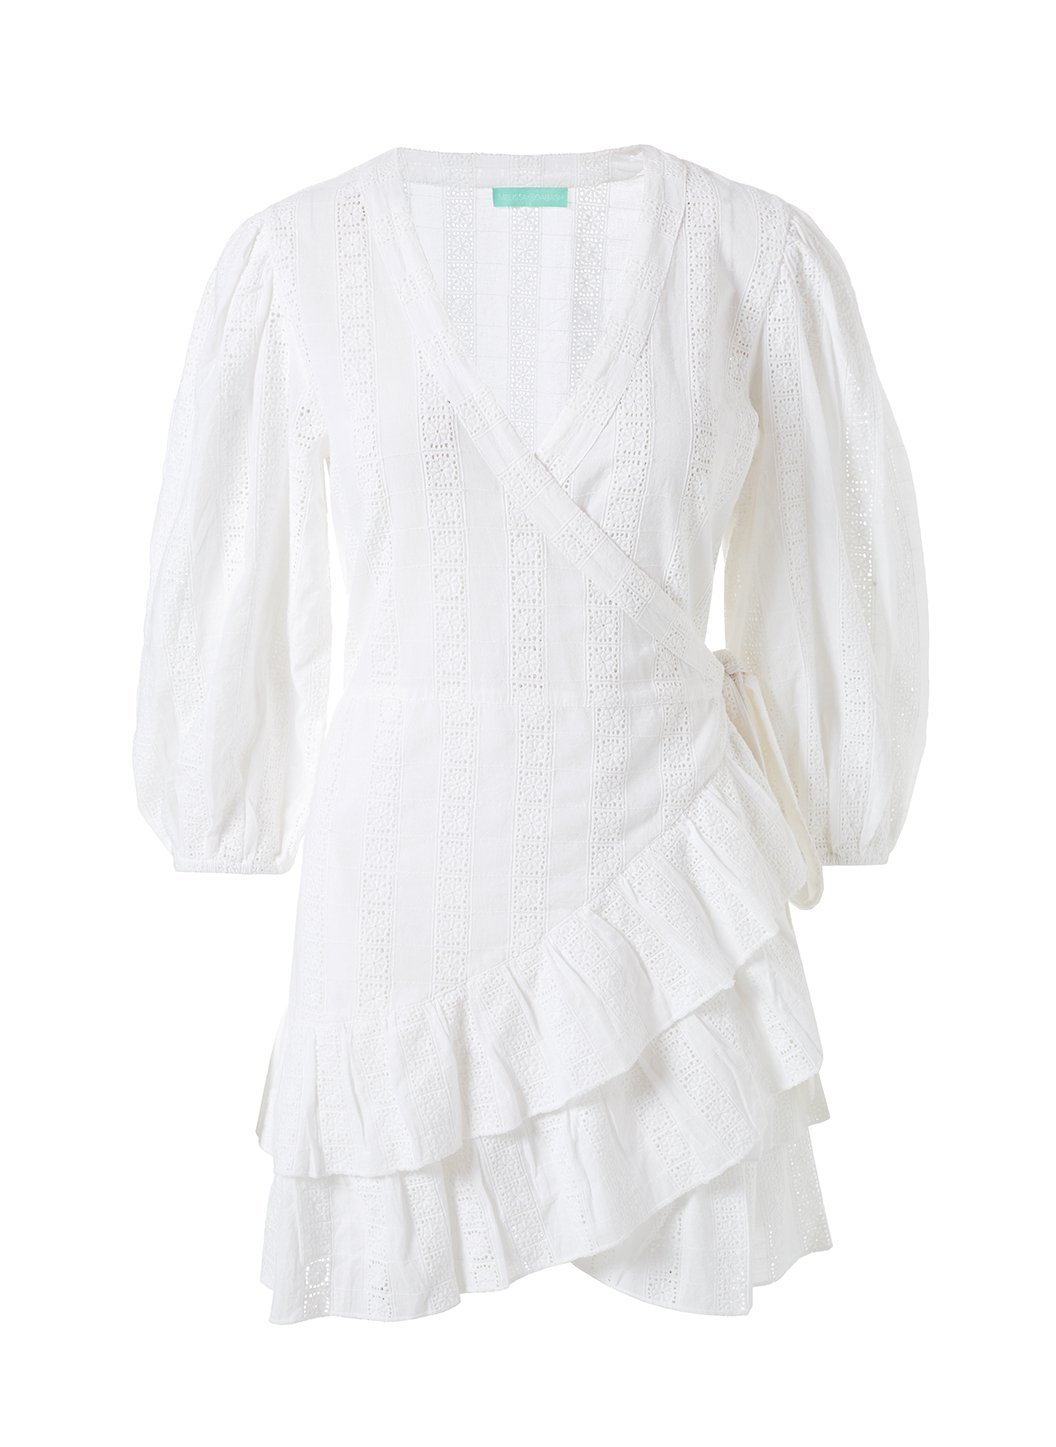 Aliyah_White_Dress_Cutouts_1056x.progressive